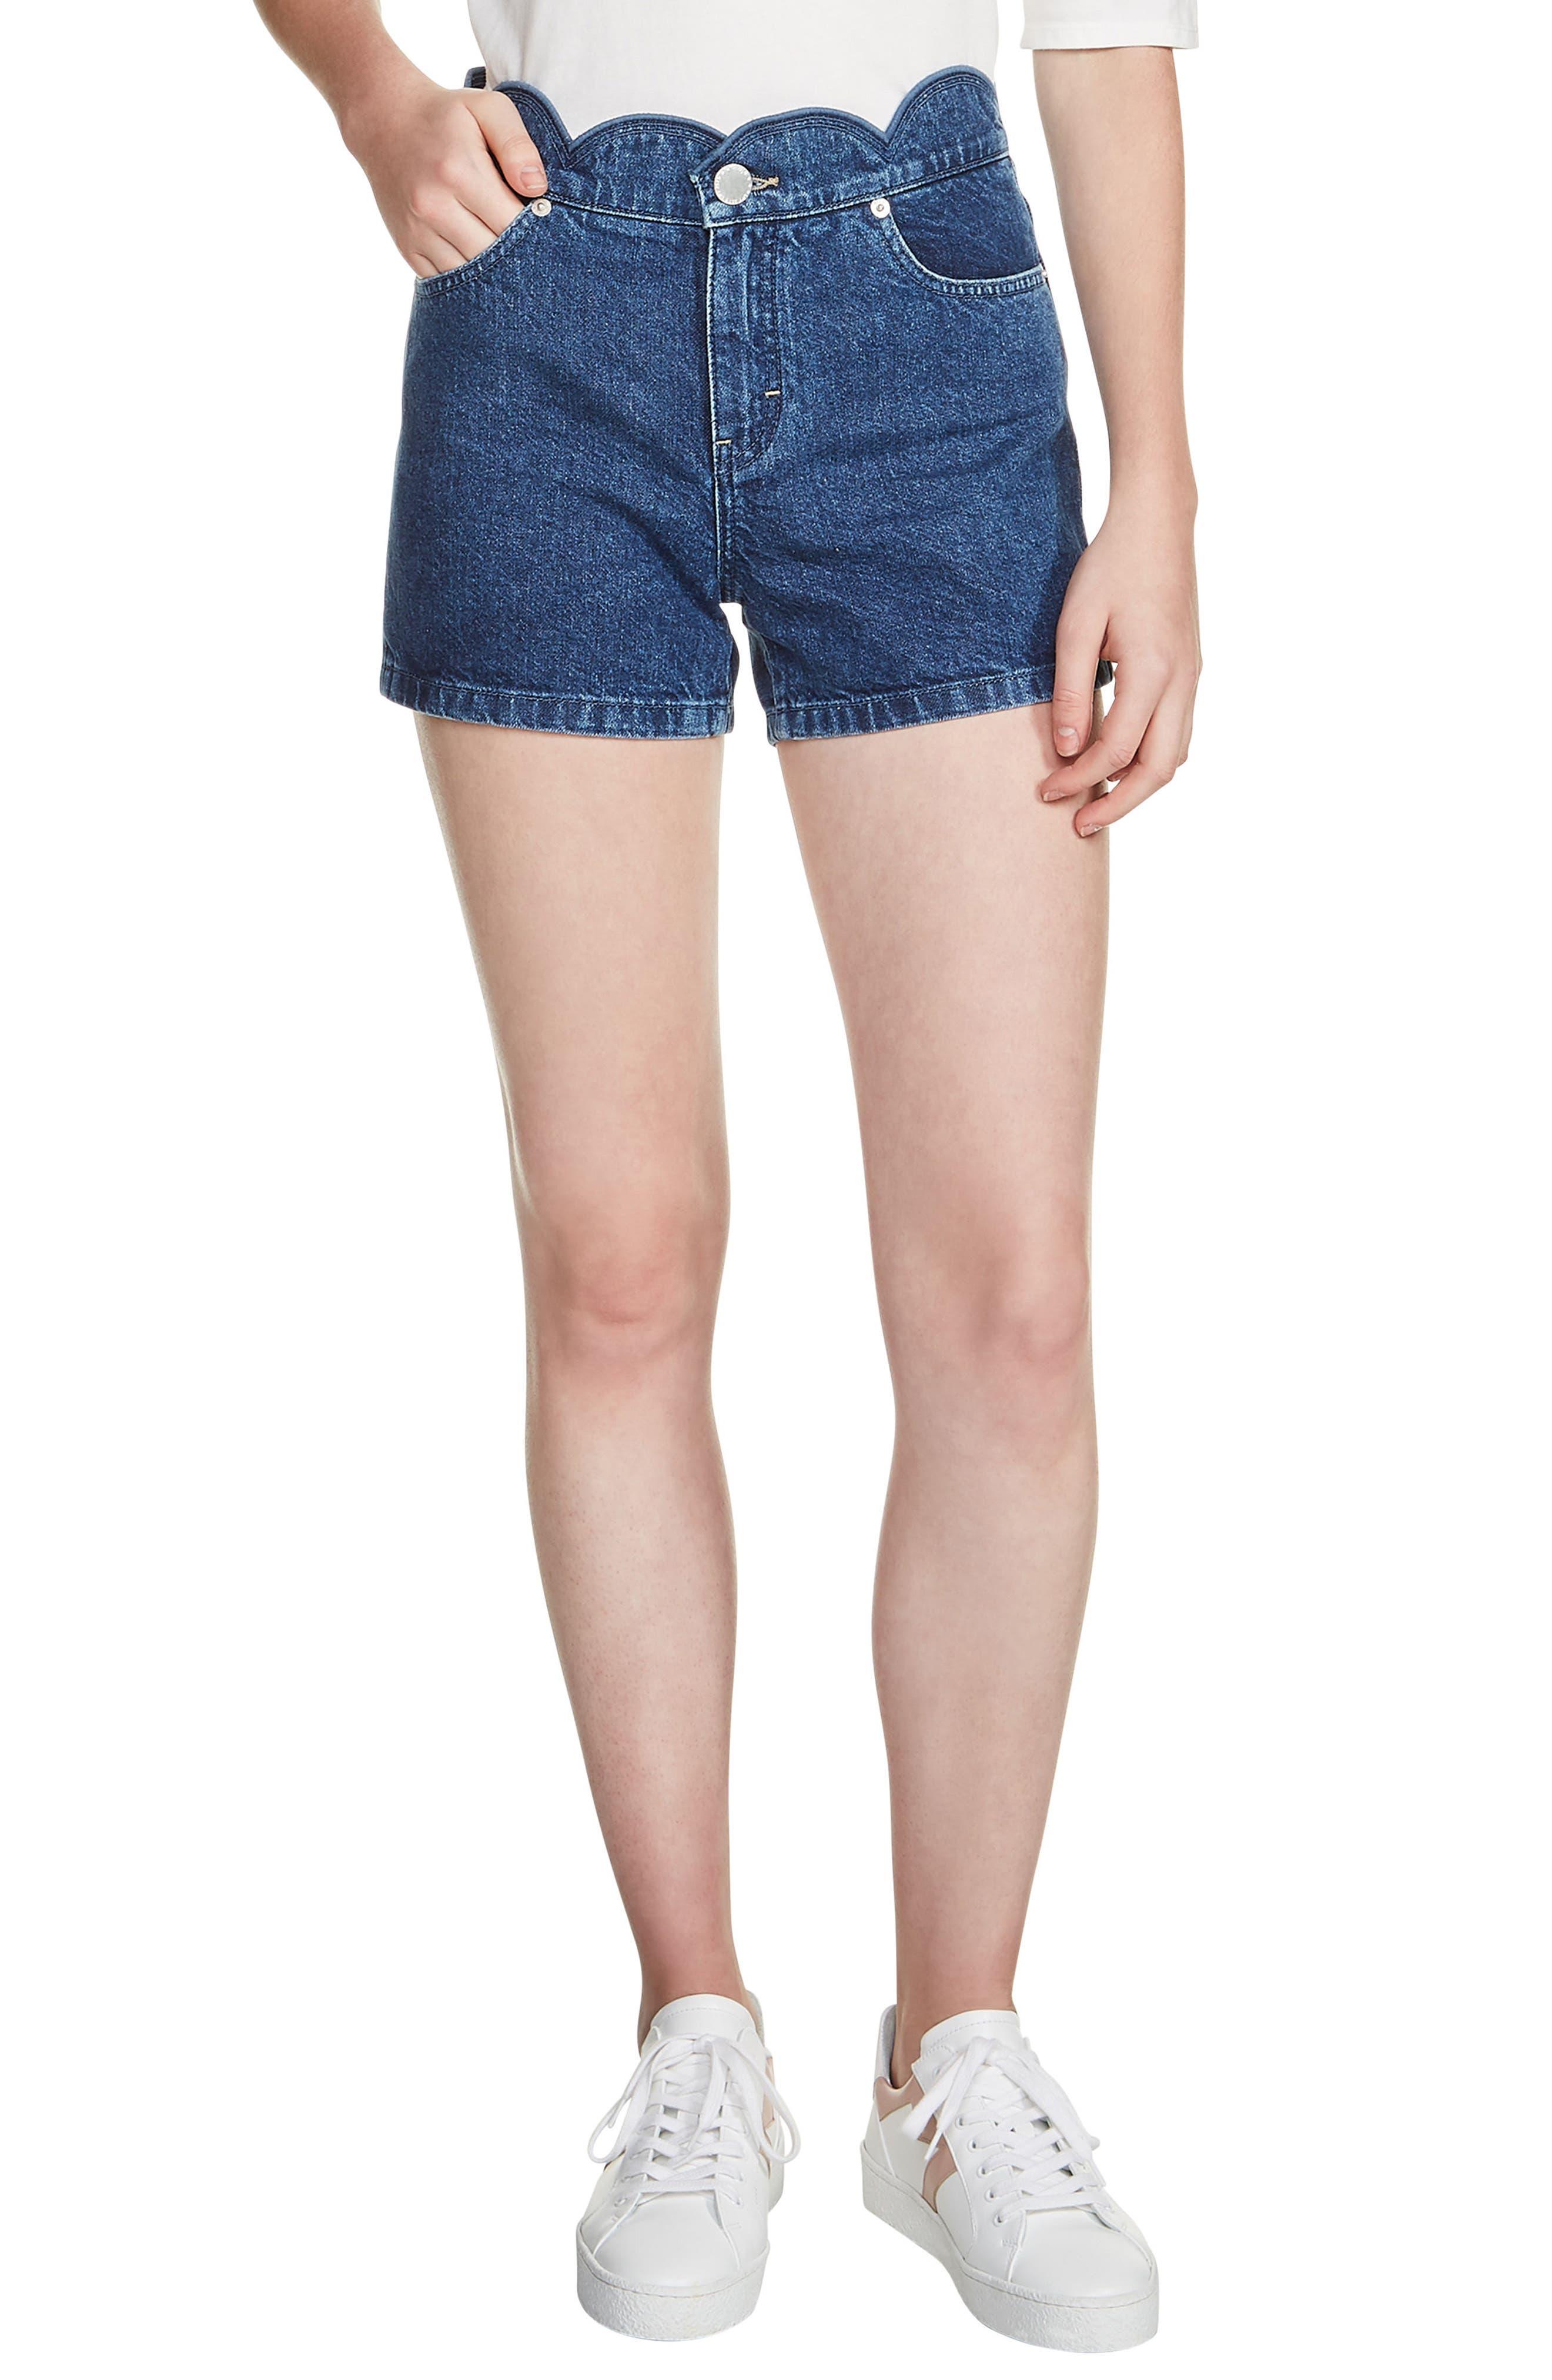 Shafti Scallop Waist Denim Shorts,                             Main thumbnail 1, color,                             Denim